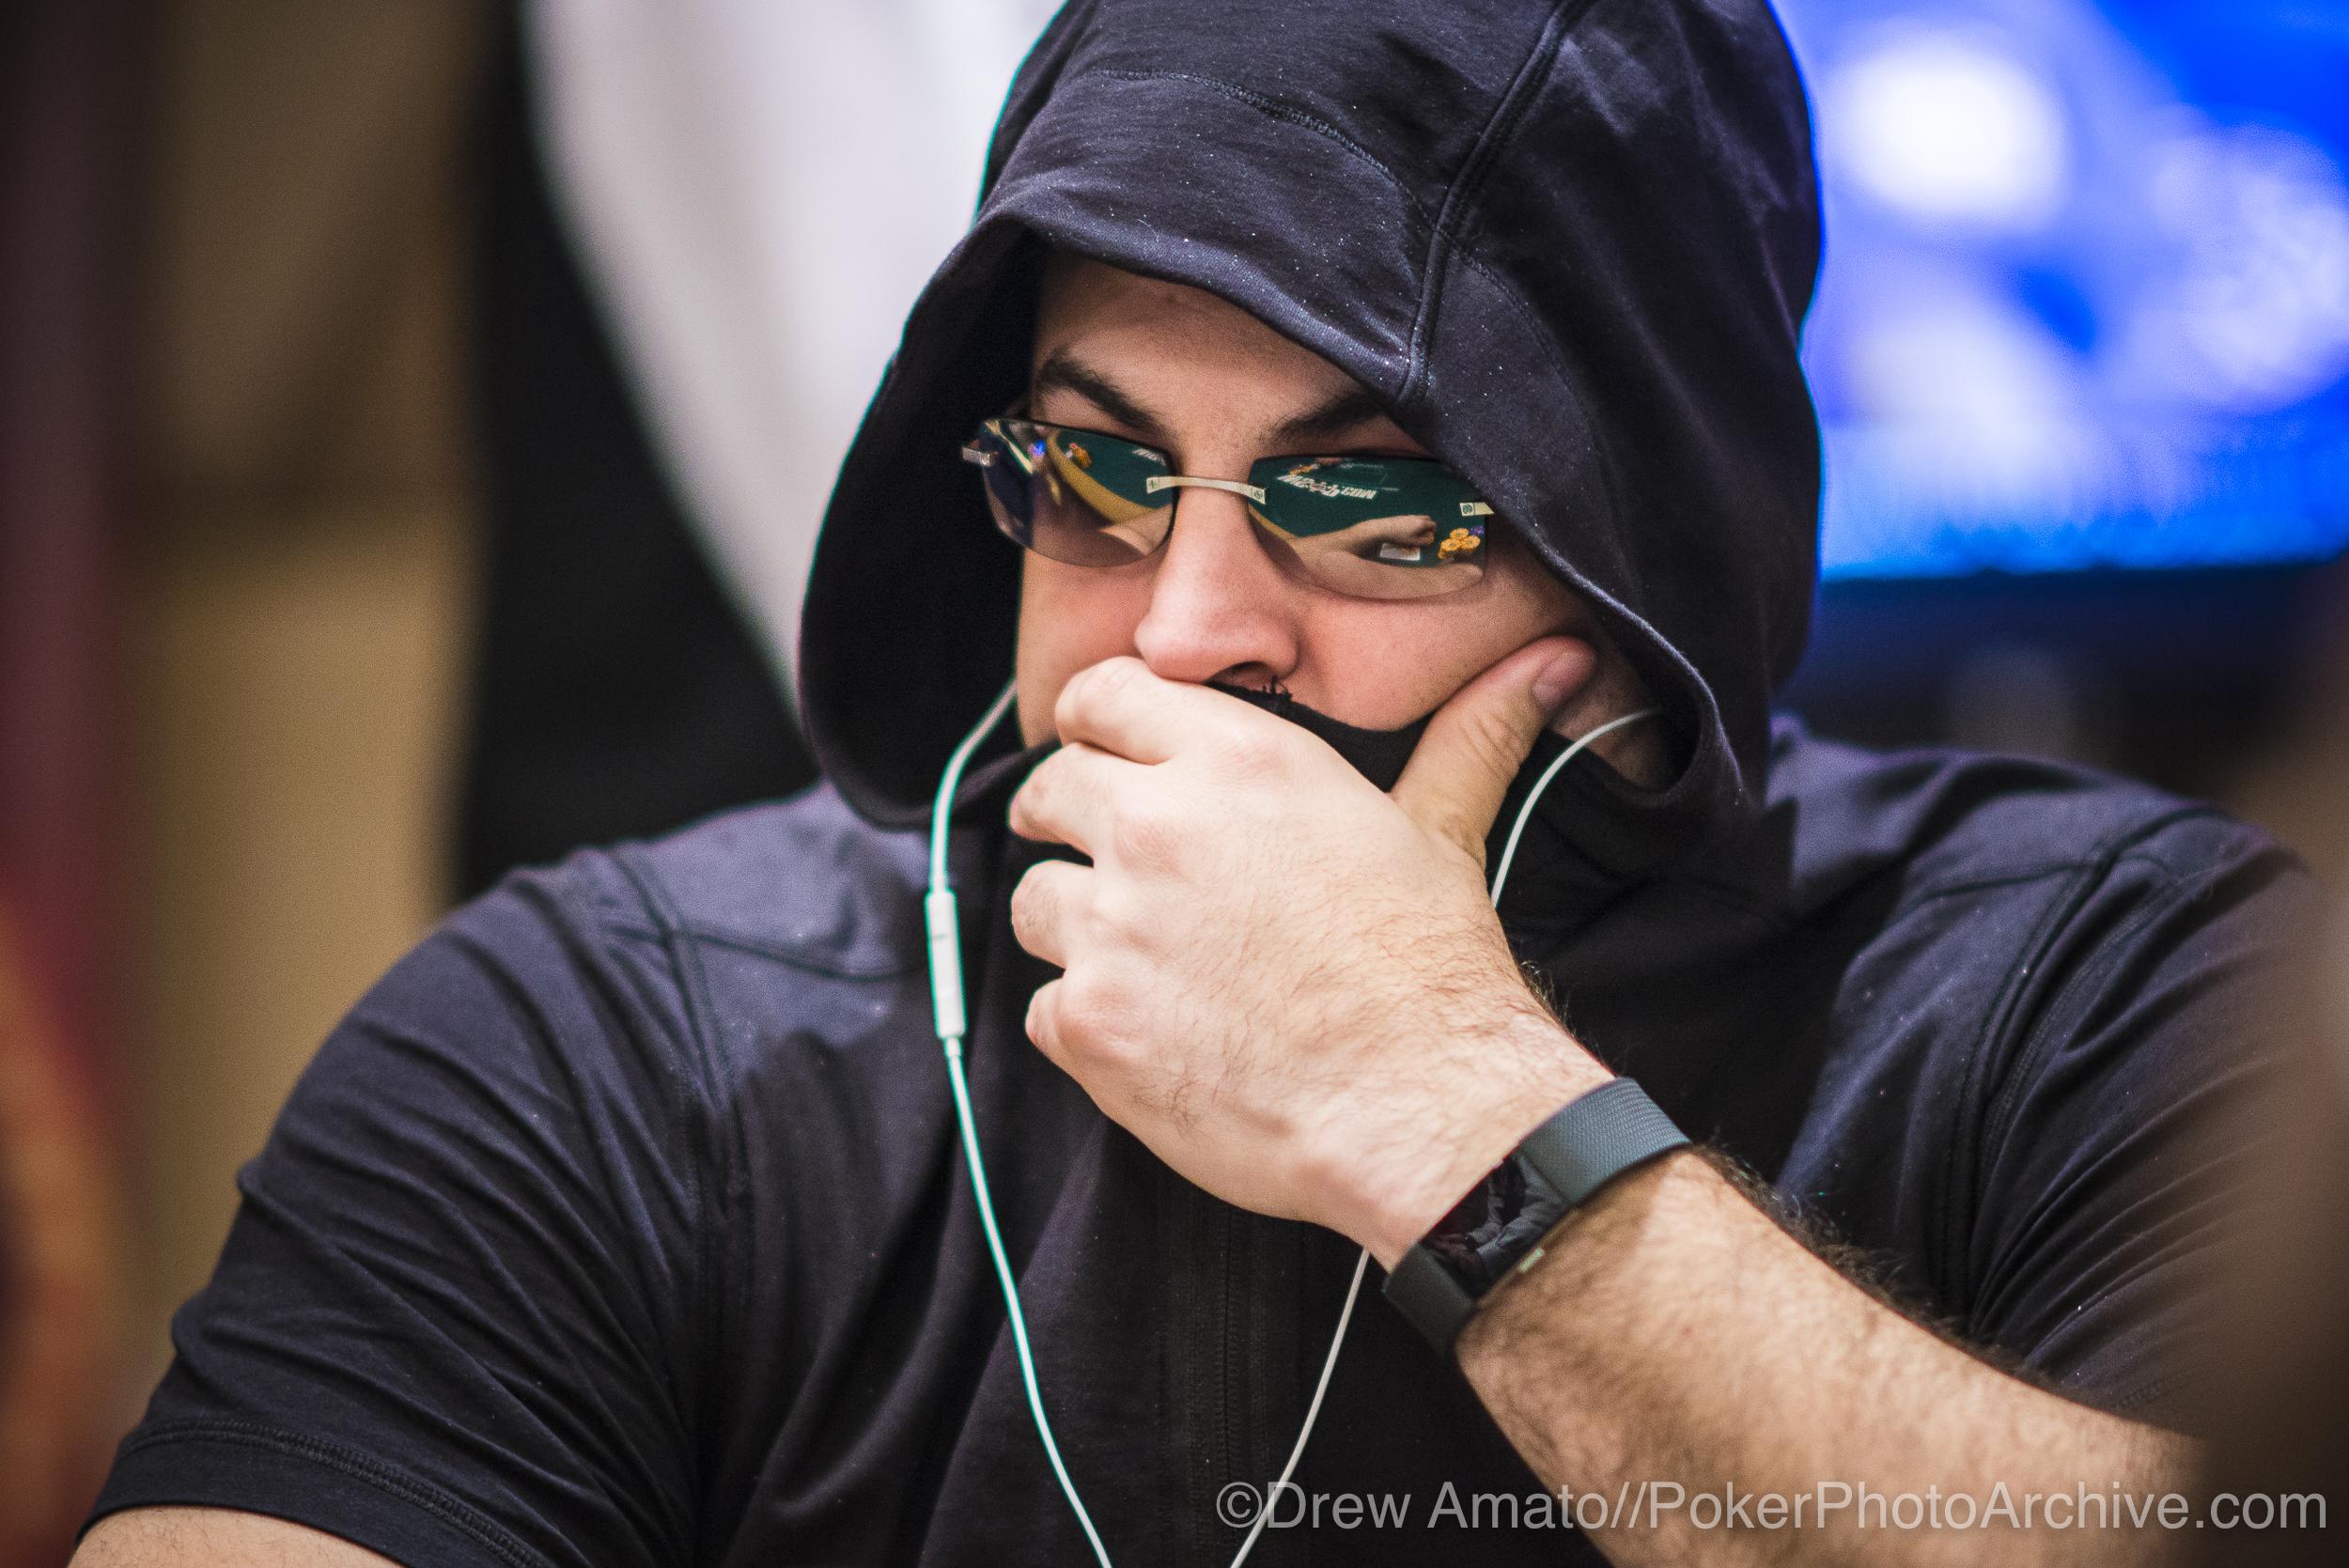 David Paredes_2017 WSOP_EV59_Day 1_Amato_DA67239.jpg